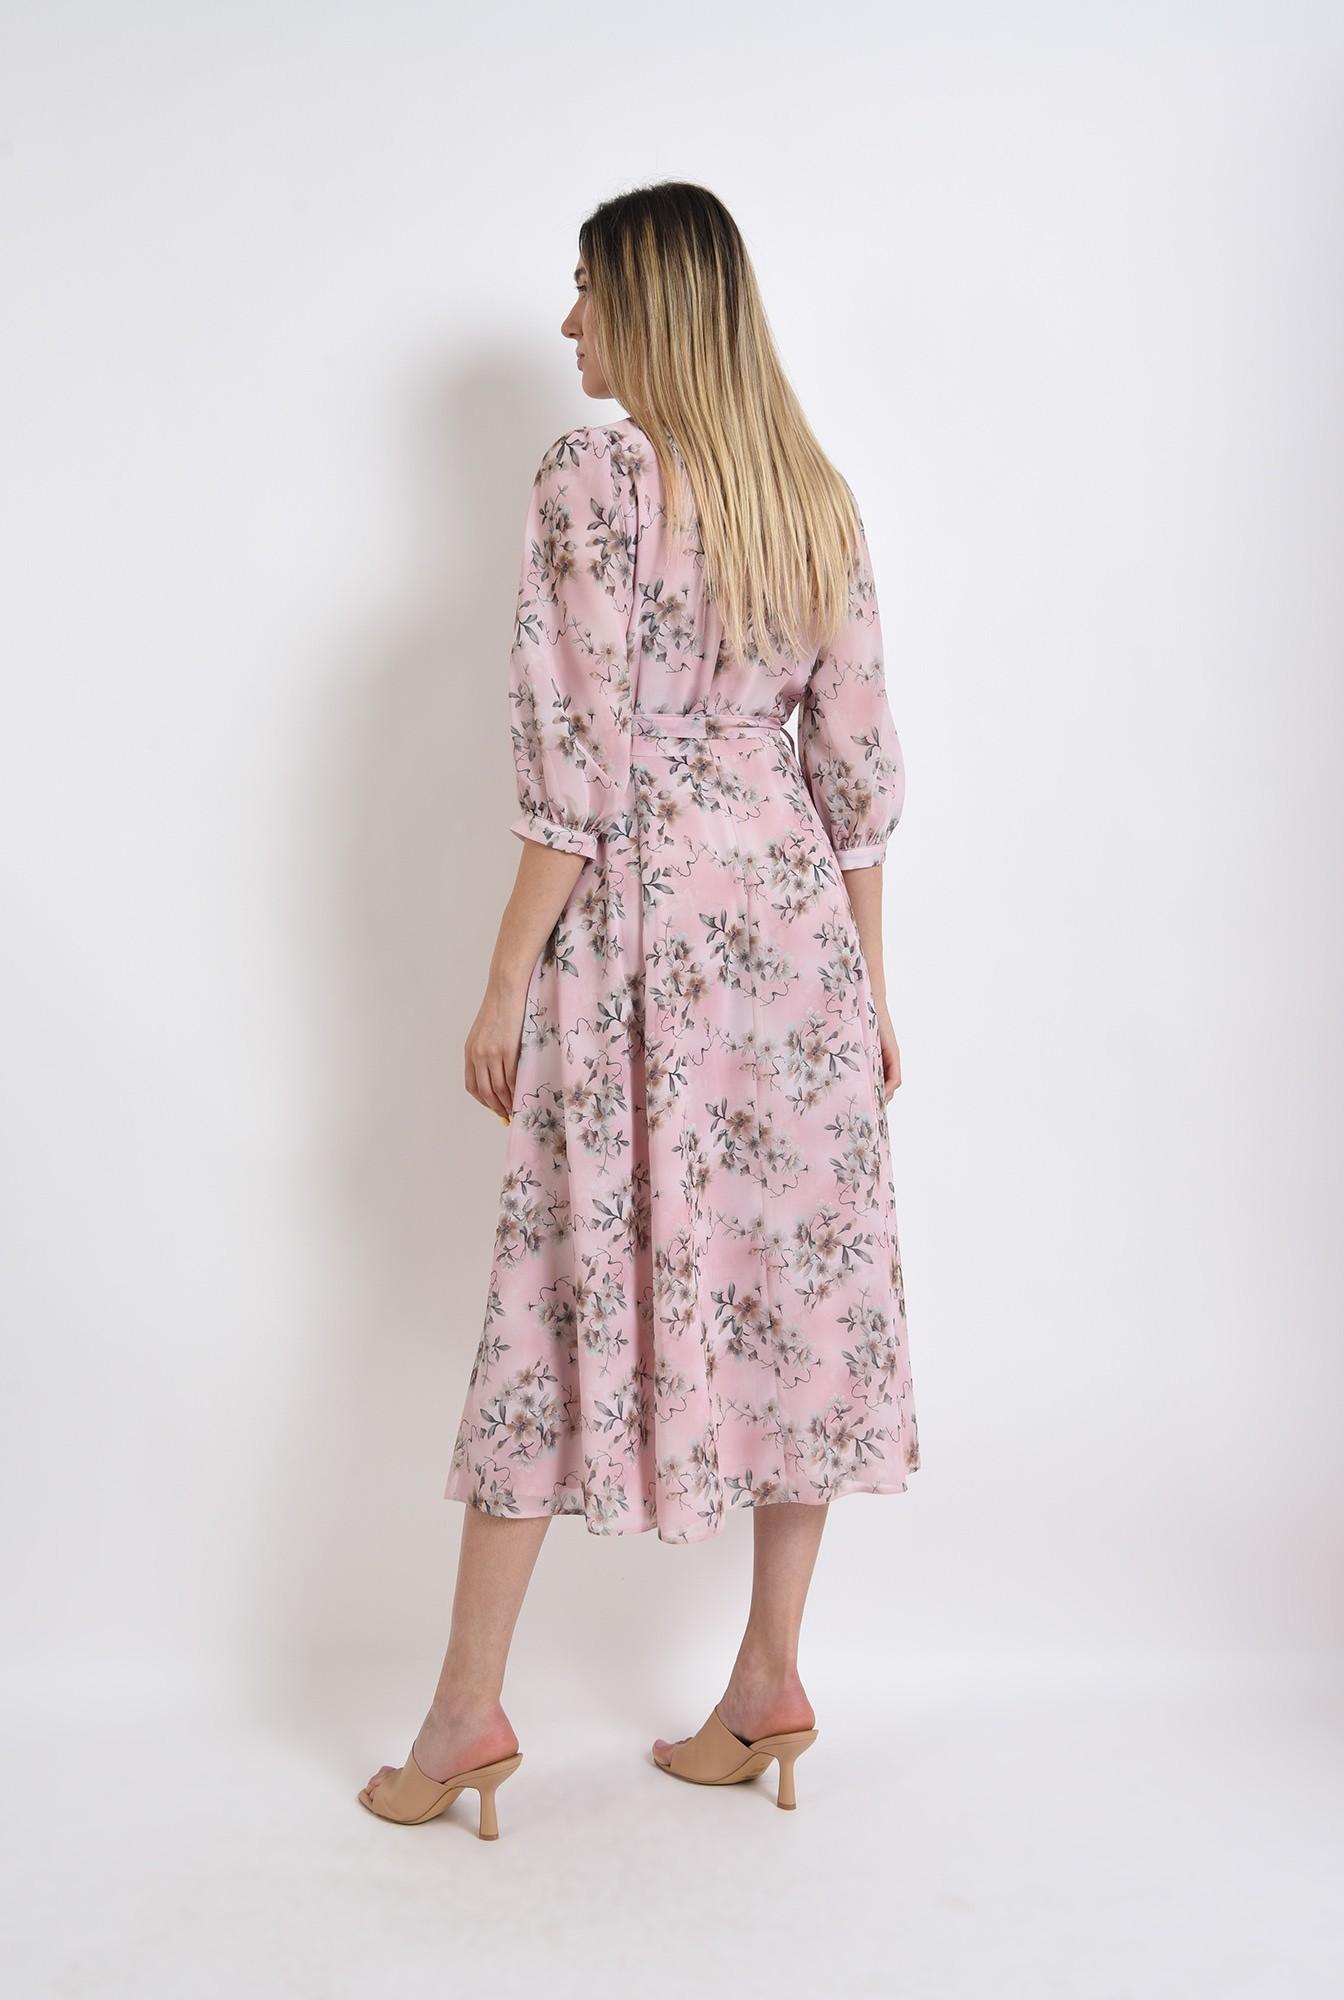 1 - rochie midi, evazata, roz, florala, eleganta